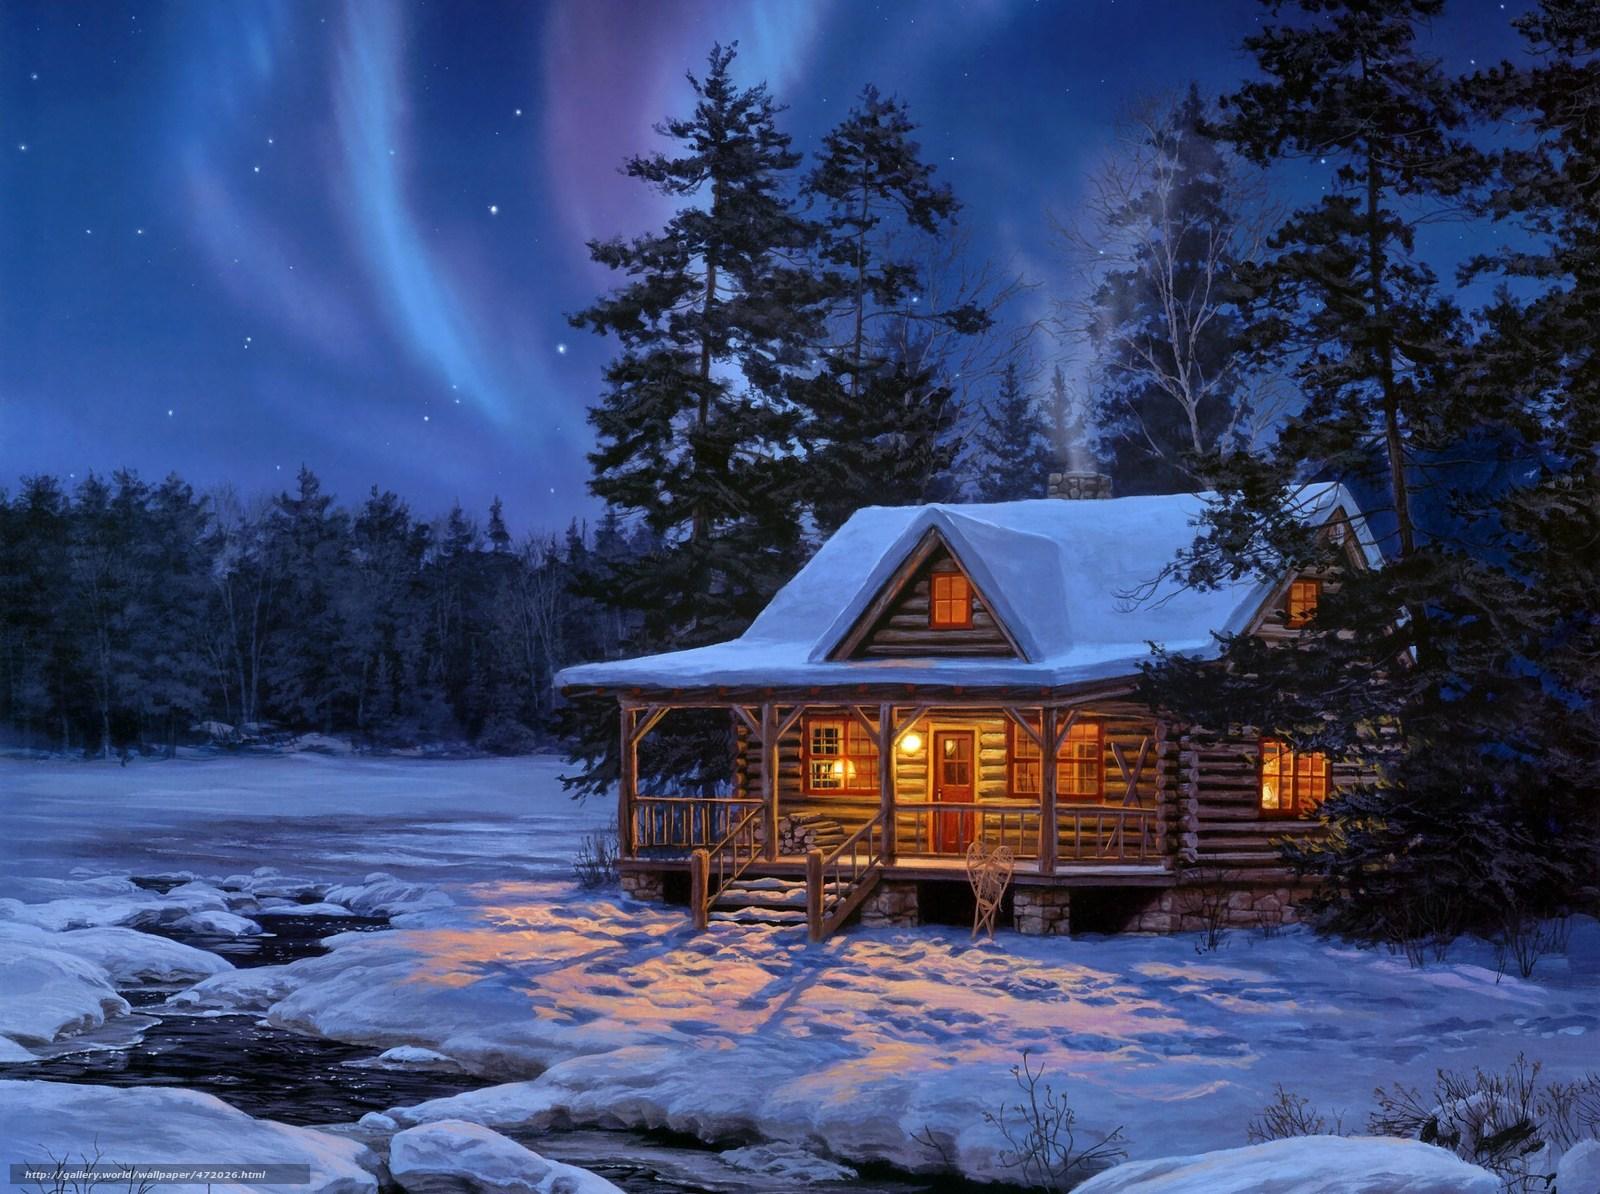 Download wallpaper painting wood log home desktop wallpaper in 1600x1194